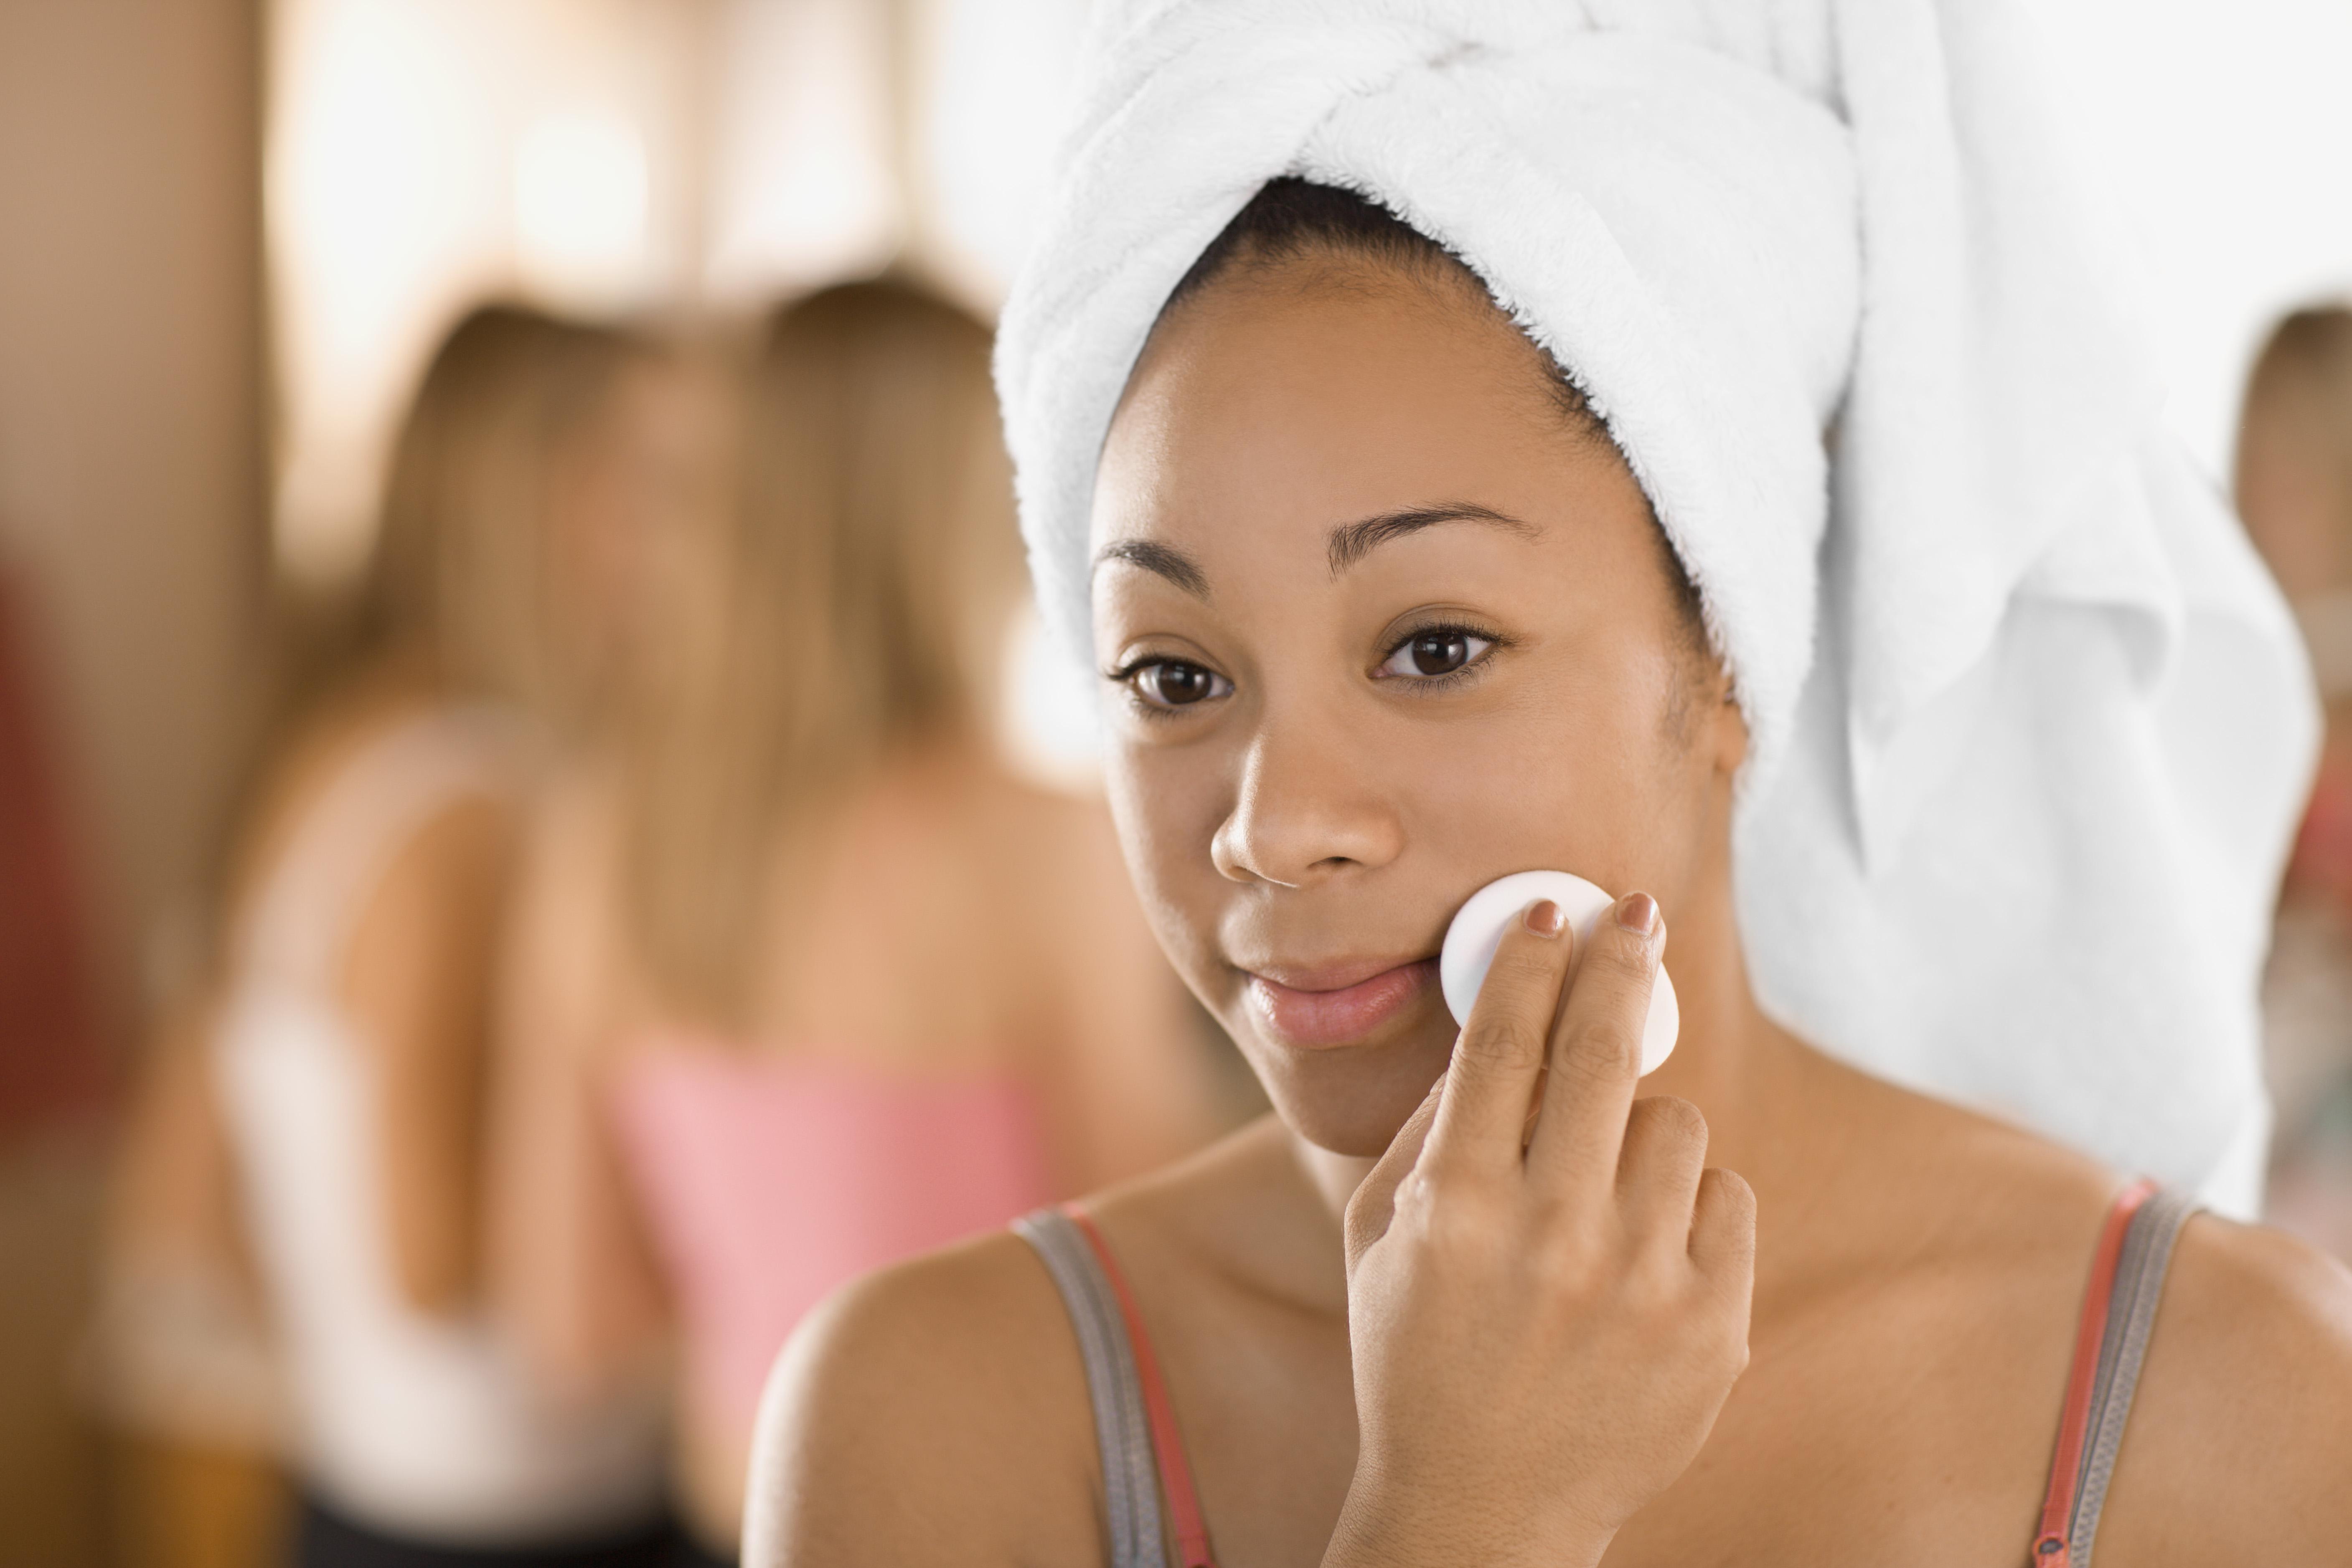 Teenage girl removing makeup